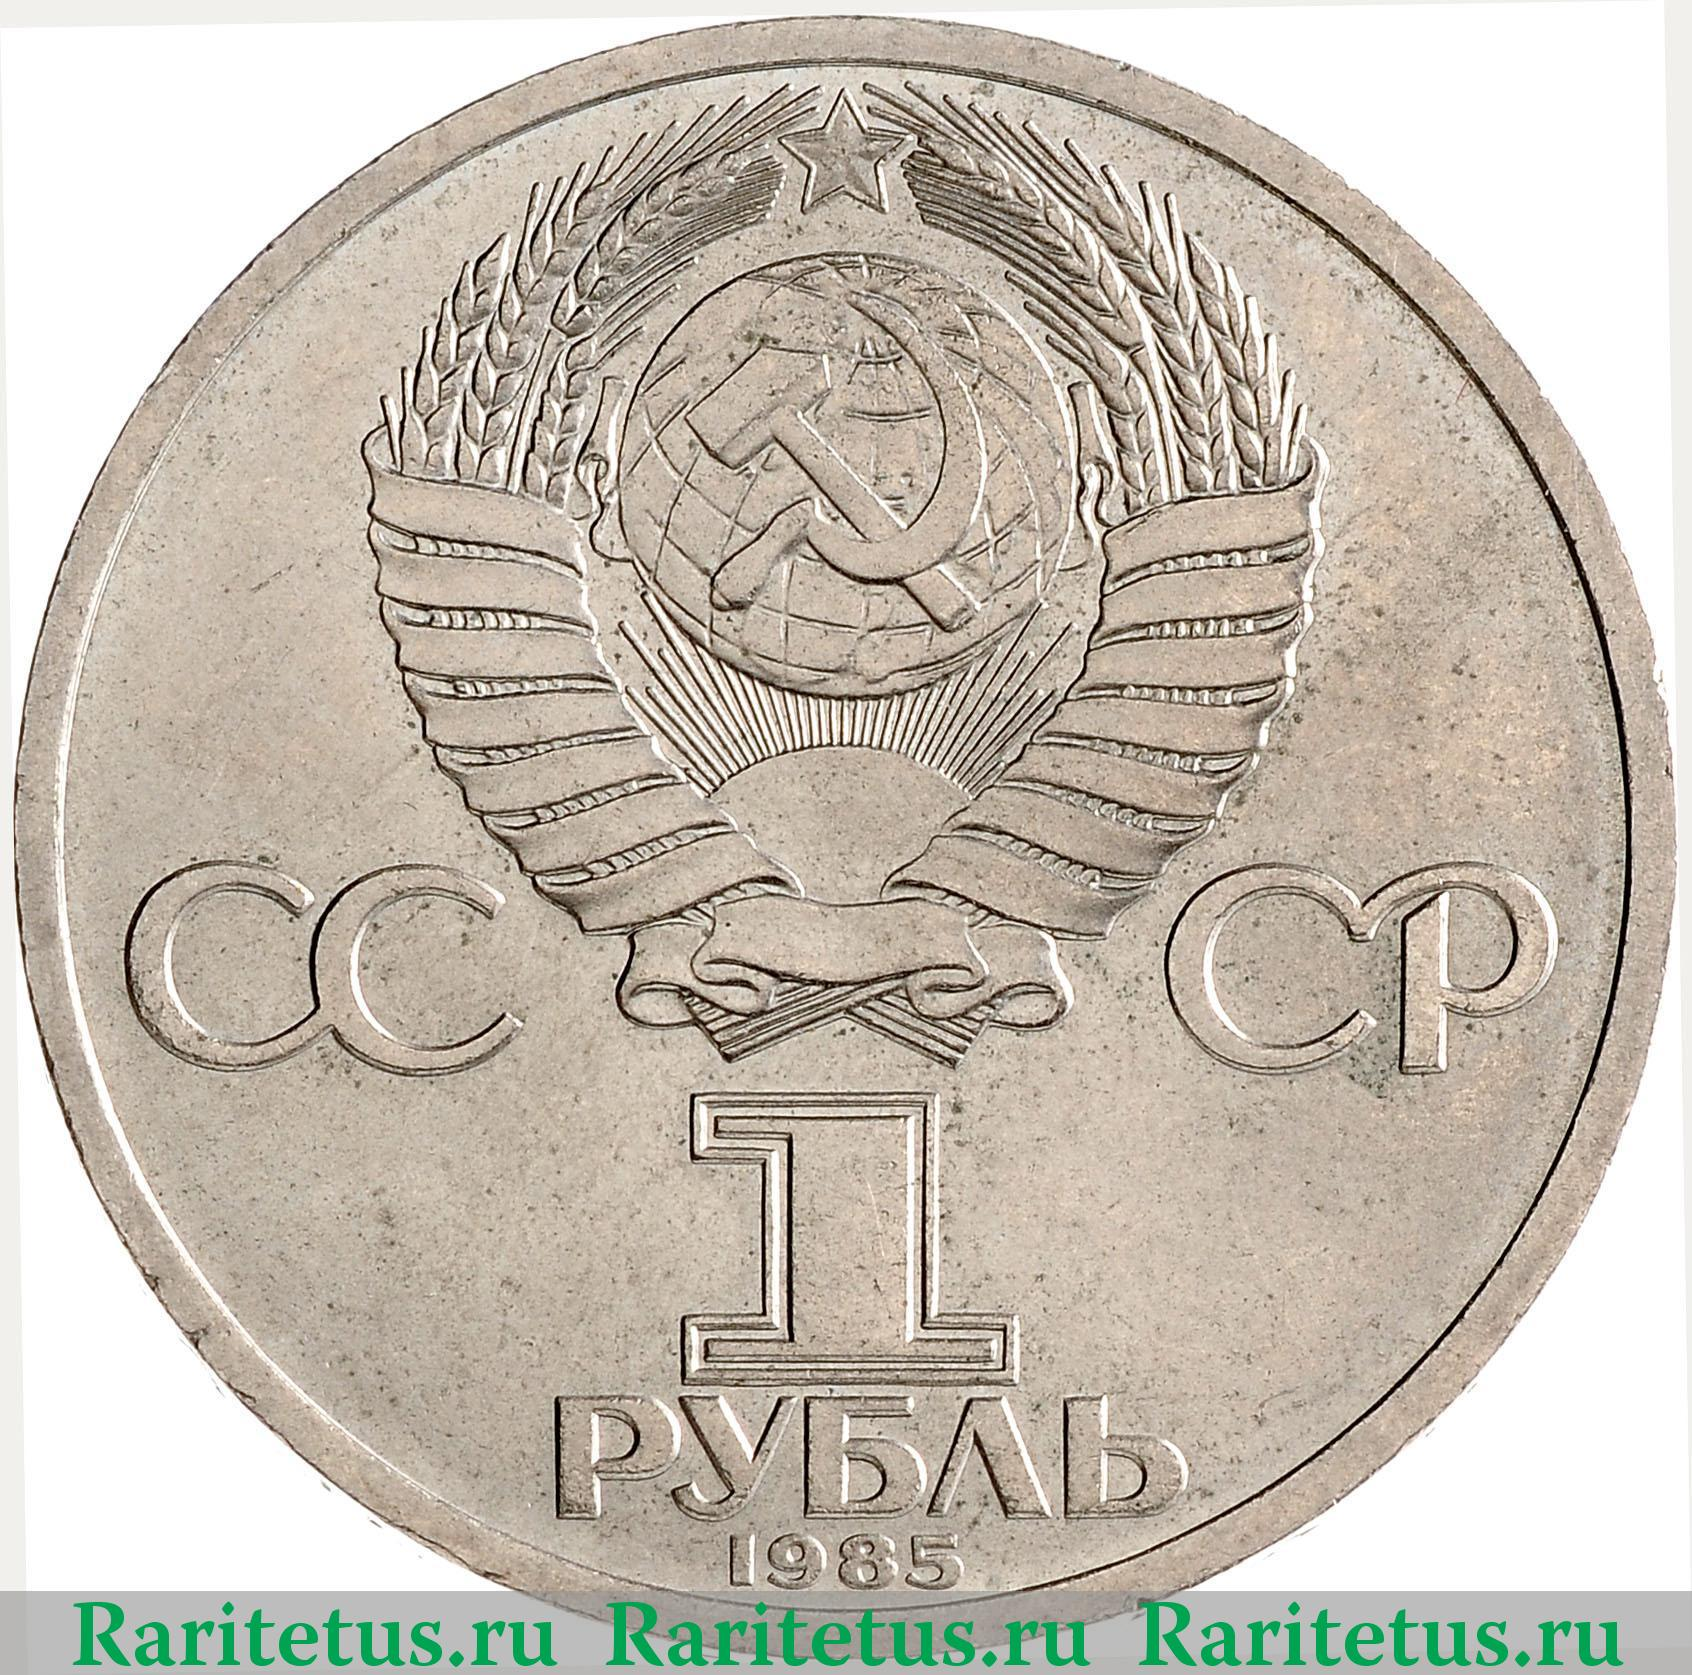 1 рубль энгельс цена 10 рублей дорогобуж 2003 цена